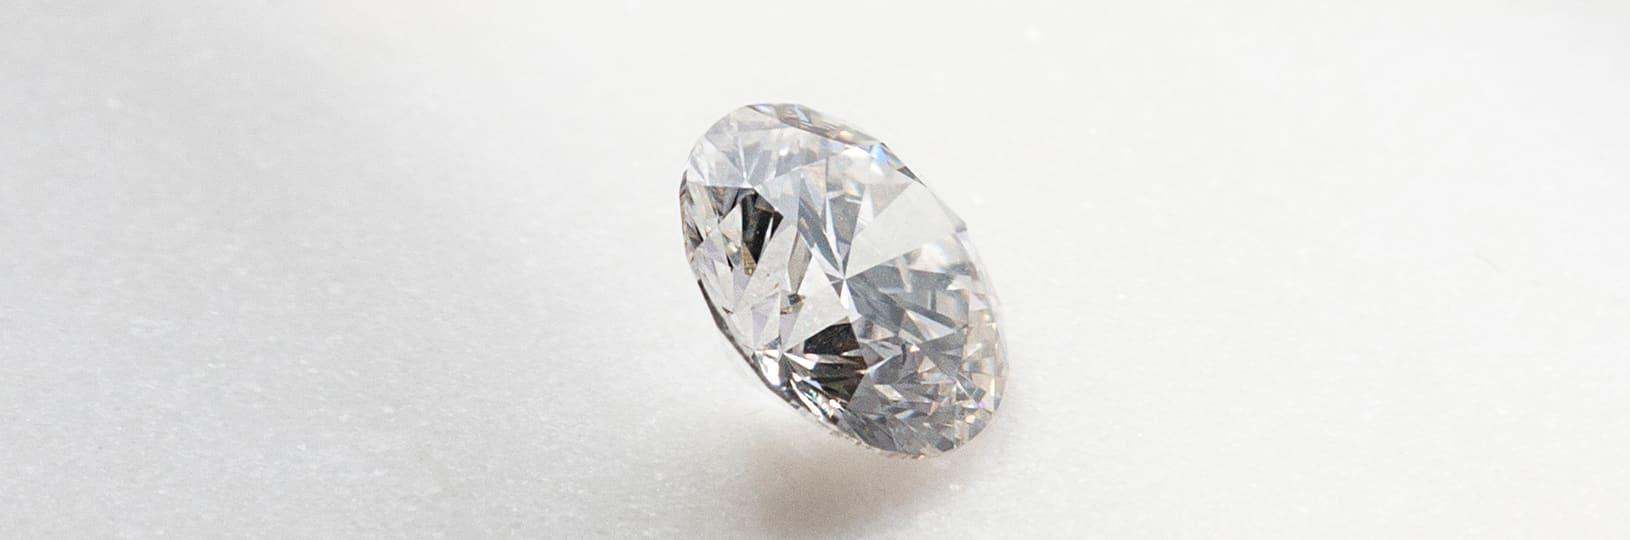 Close up image of an oval cut lab grown diamond